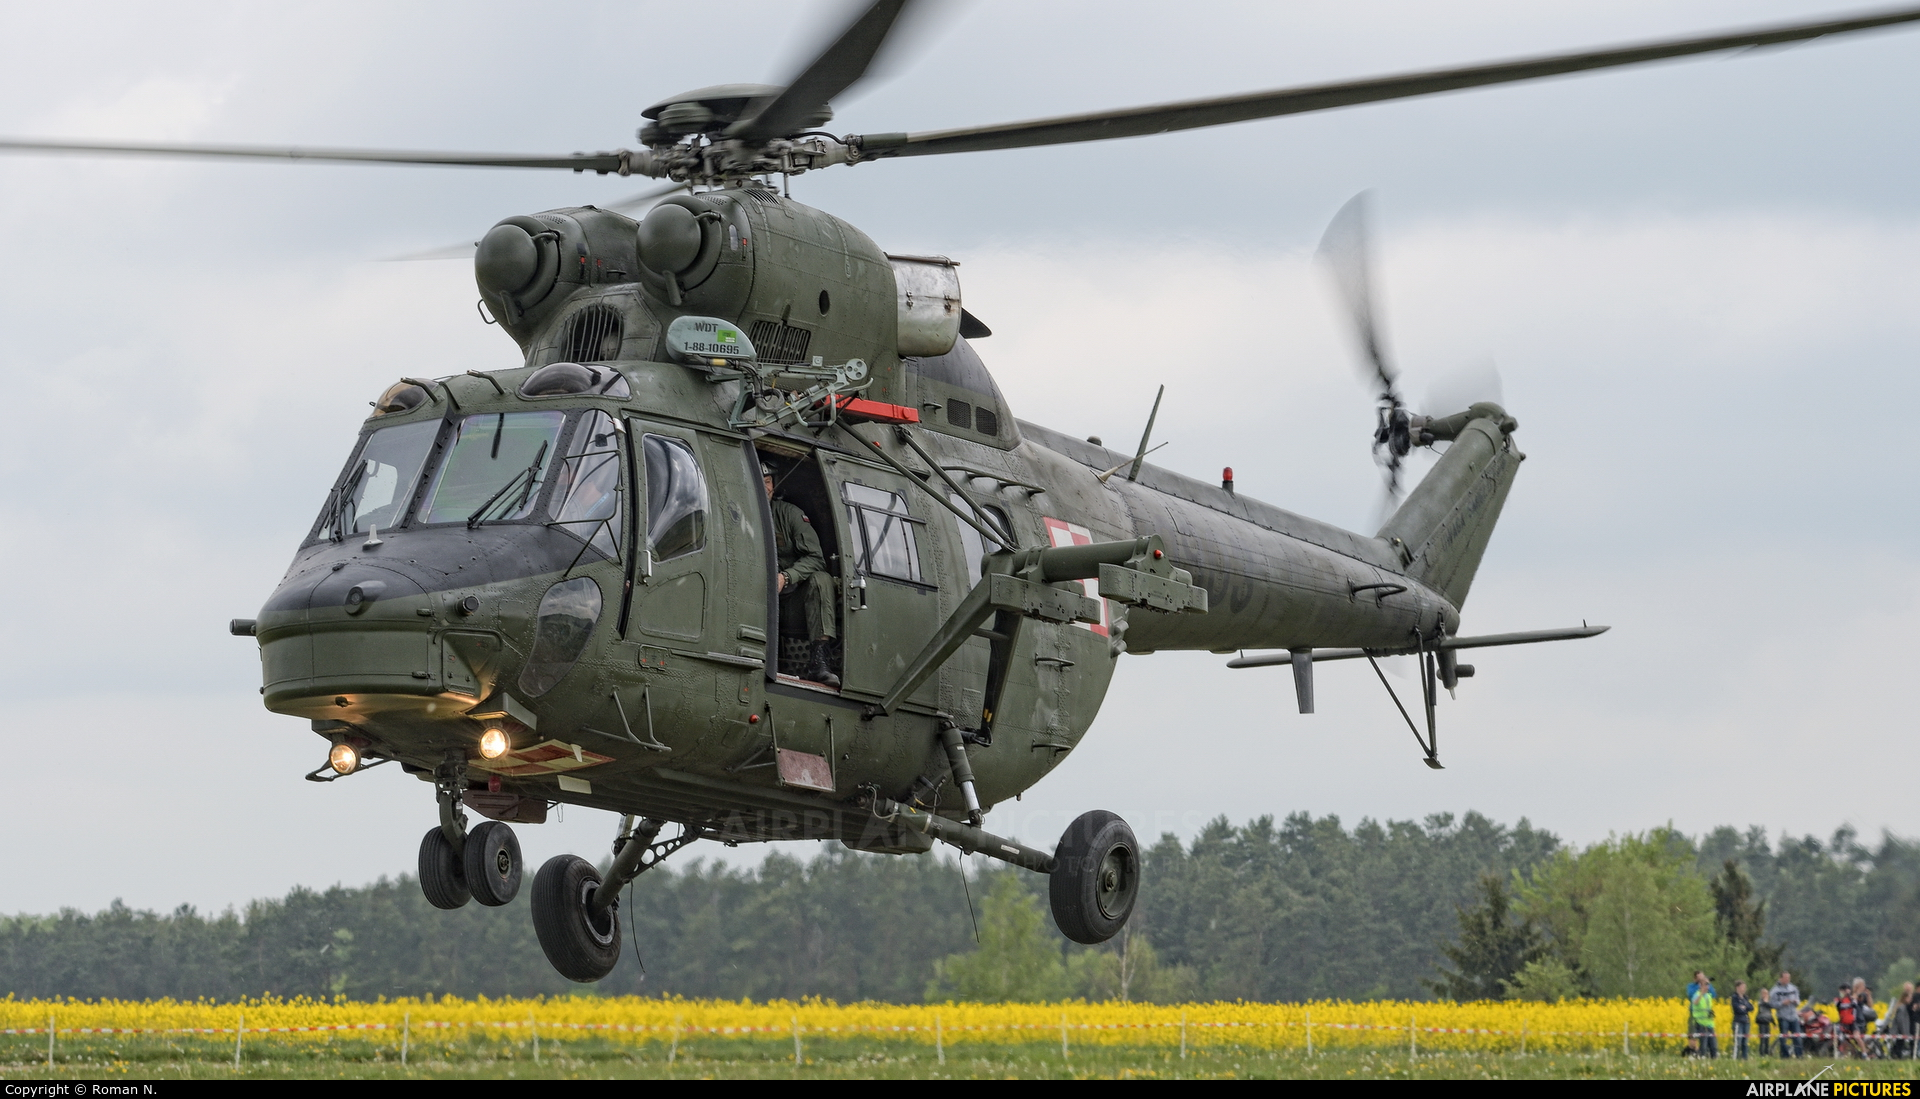 Poland - Army 0903 aircraft at Off Airport - Poland